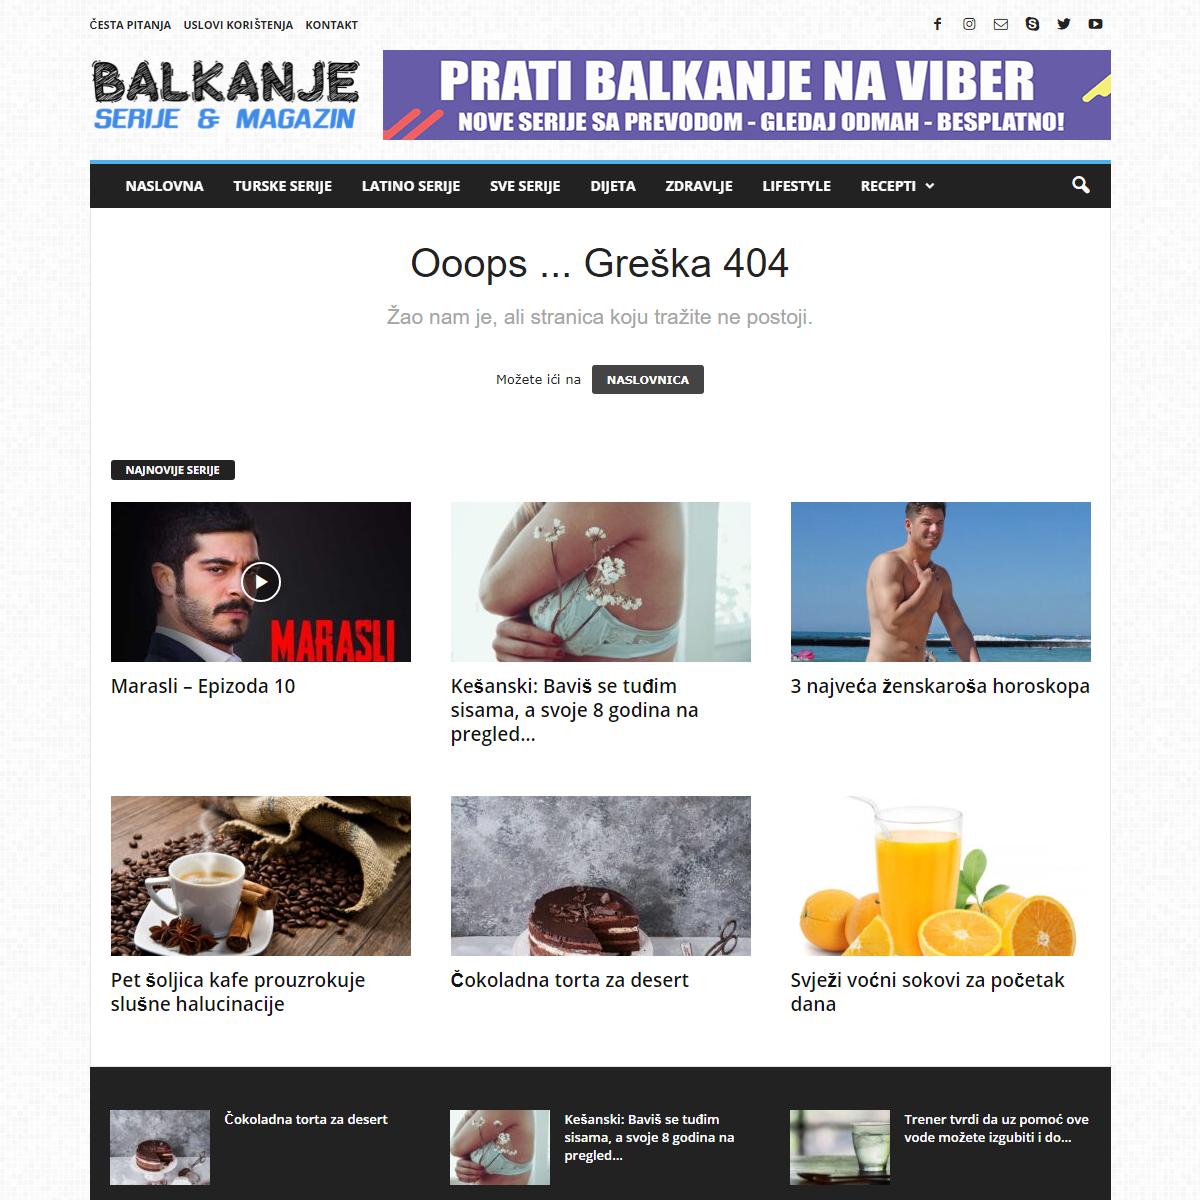 Page not found - BALKANJE